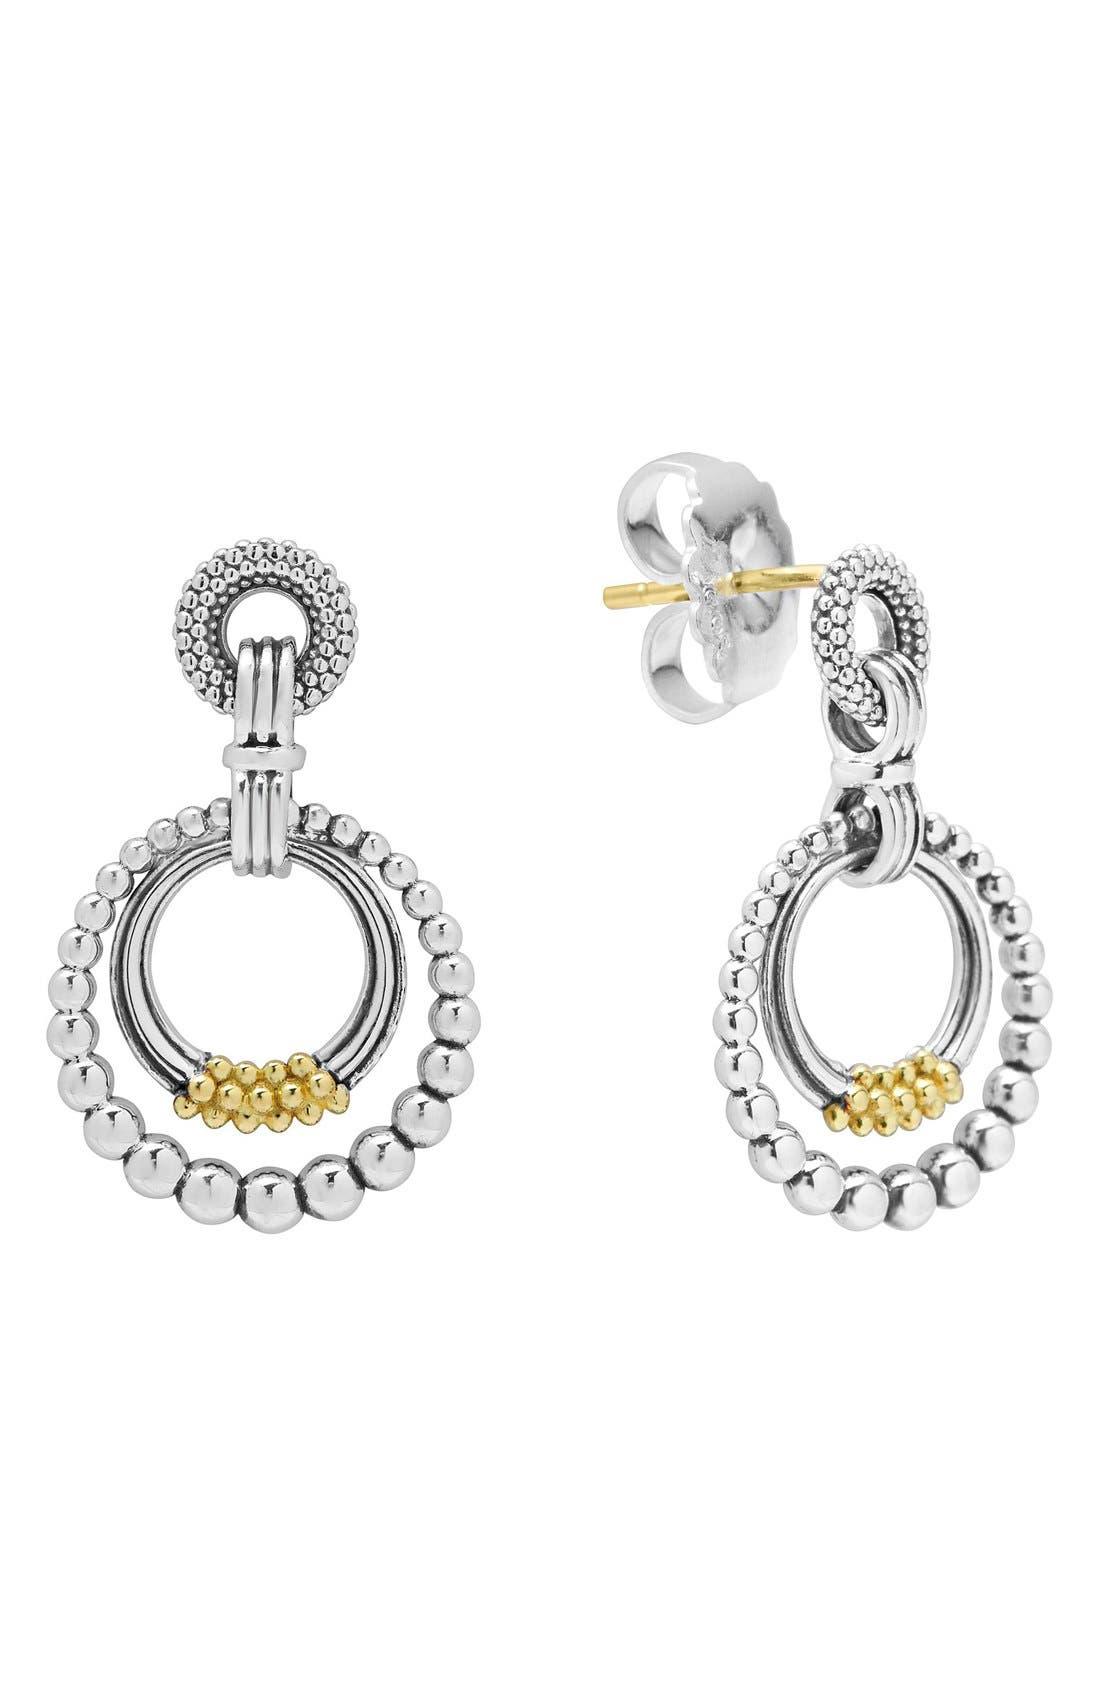 Caviar 'Superfine' Two-Tone Door Knocker Earrings,                             Main thumbnail 1, color,                             Silver/ Gold